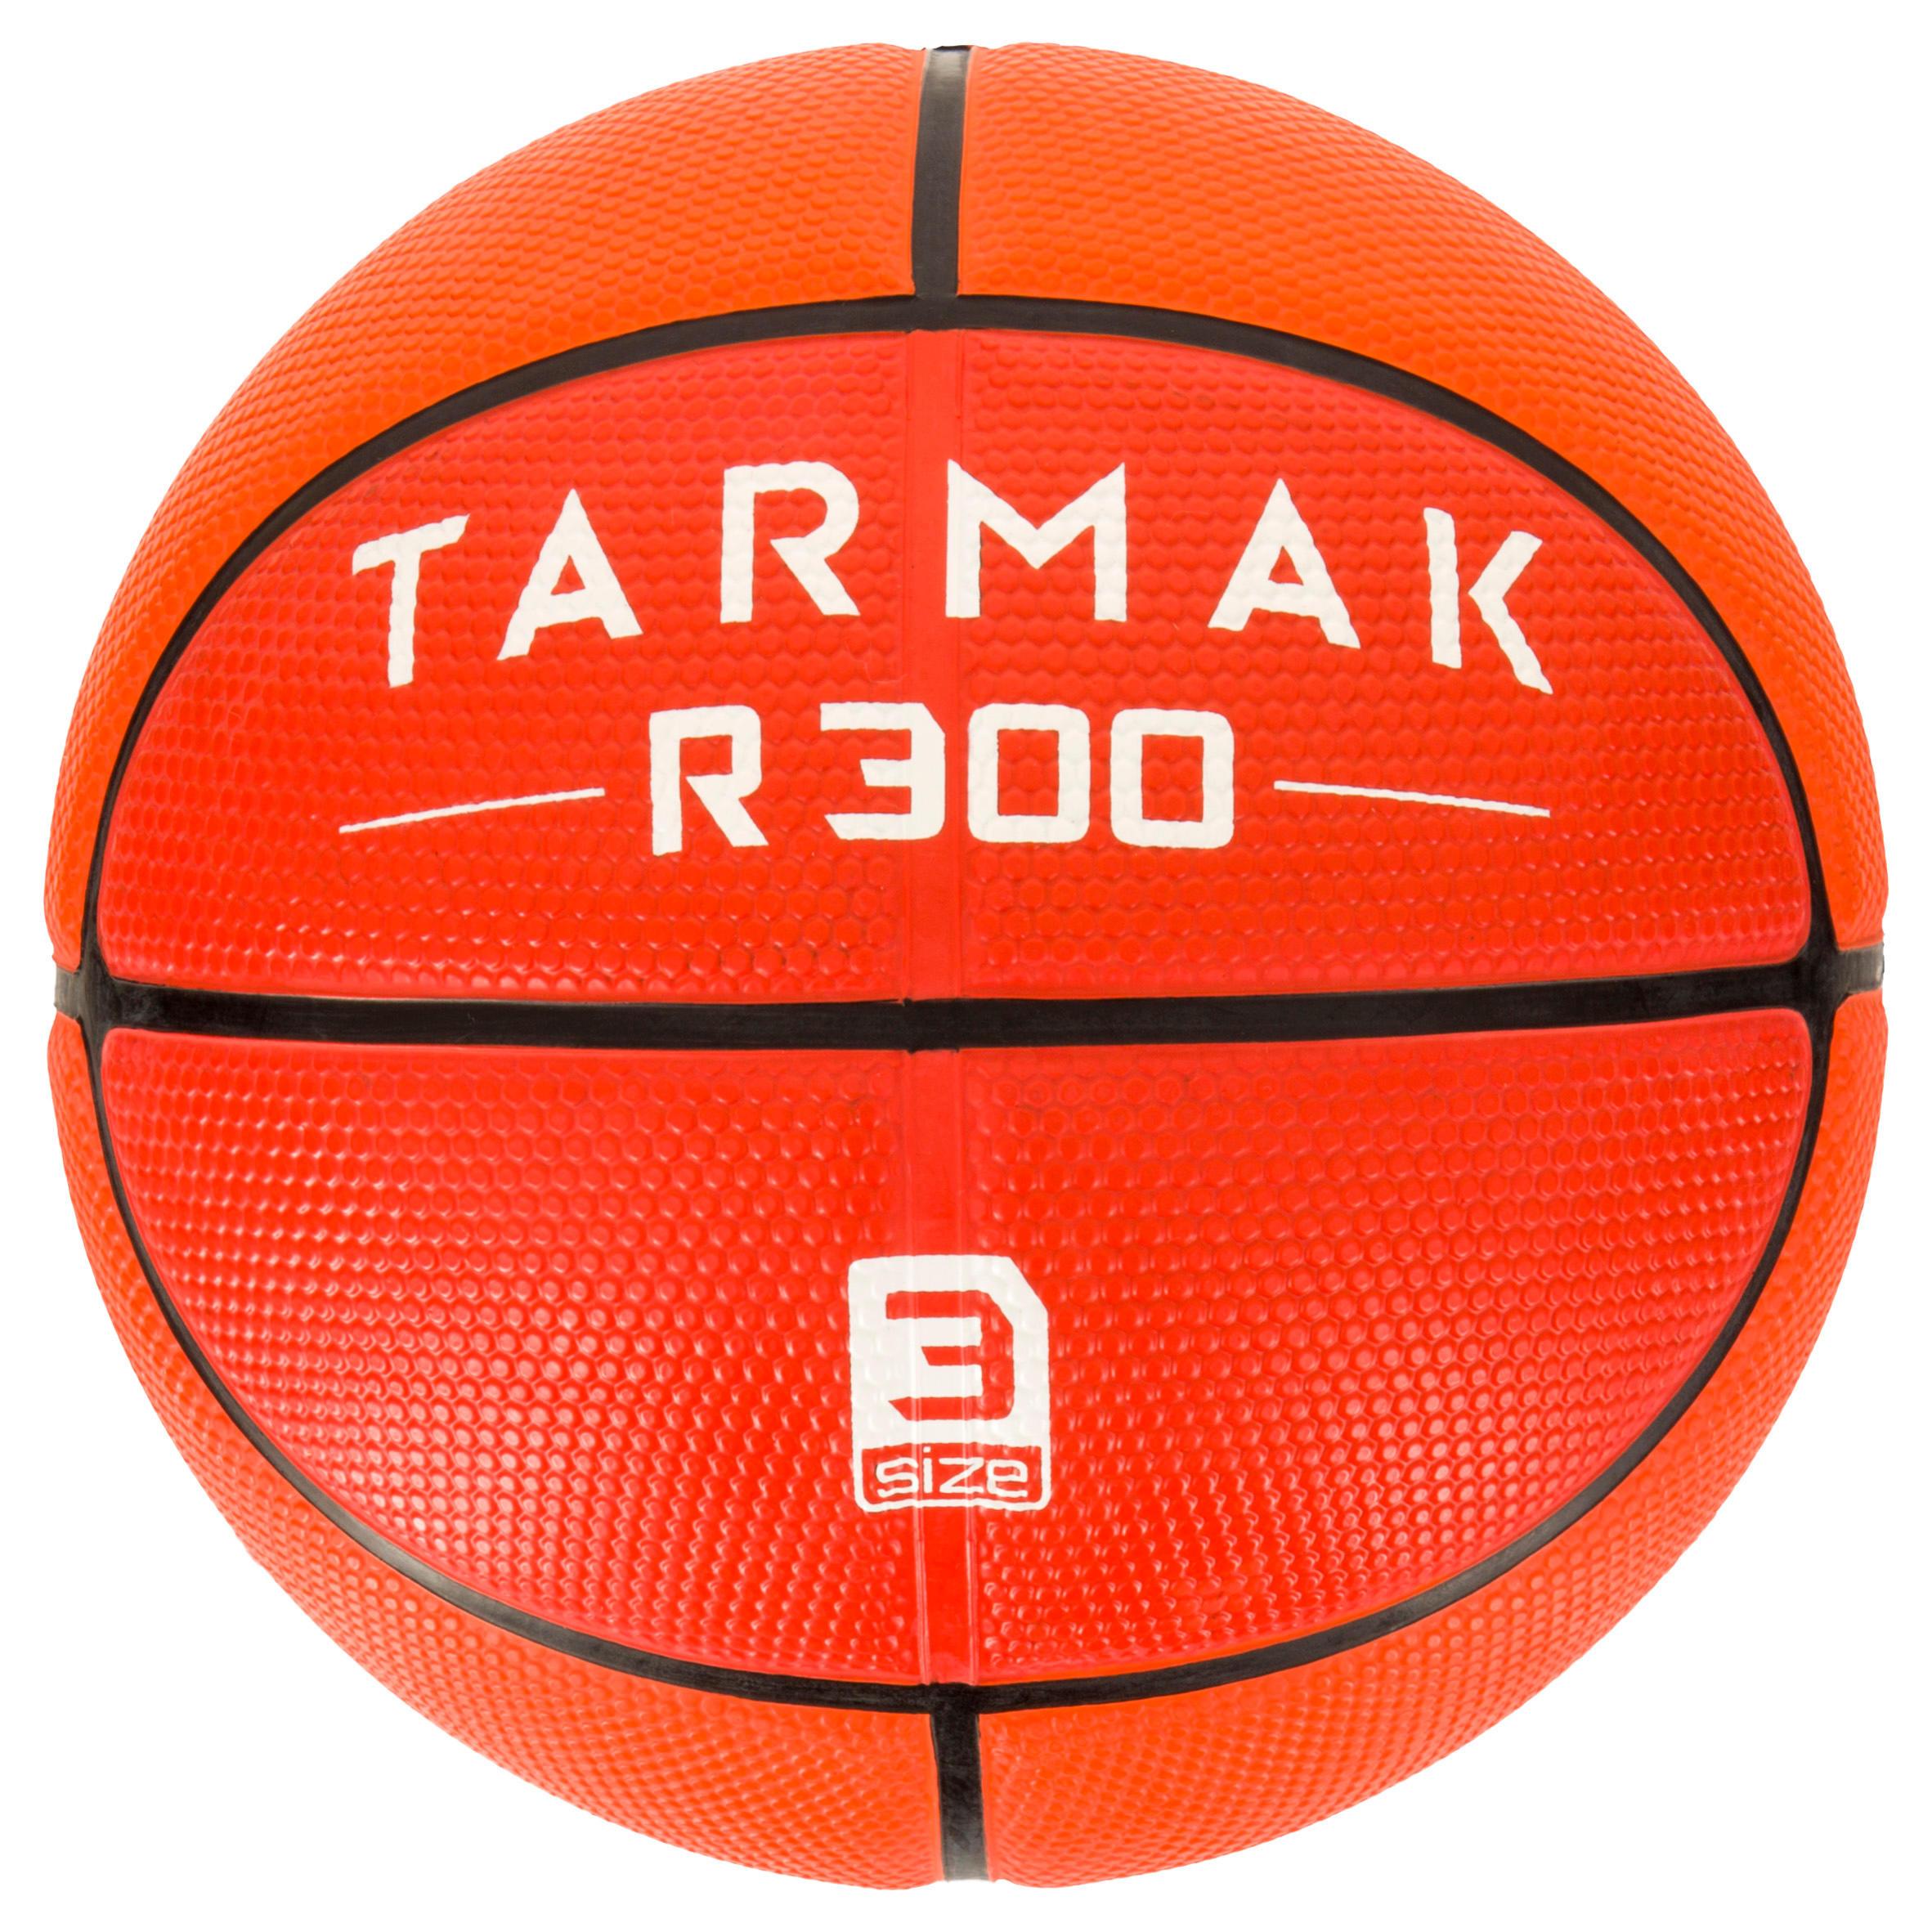 Tarmak 300 Adult Size 3 Basketball - Orange